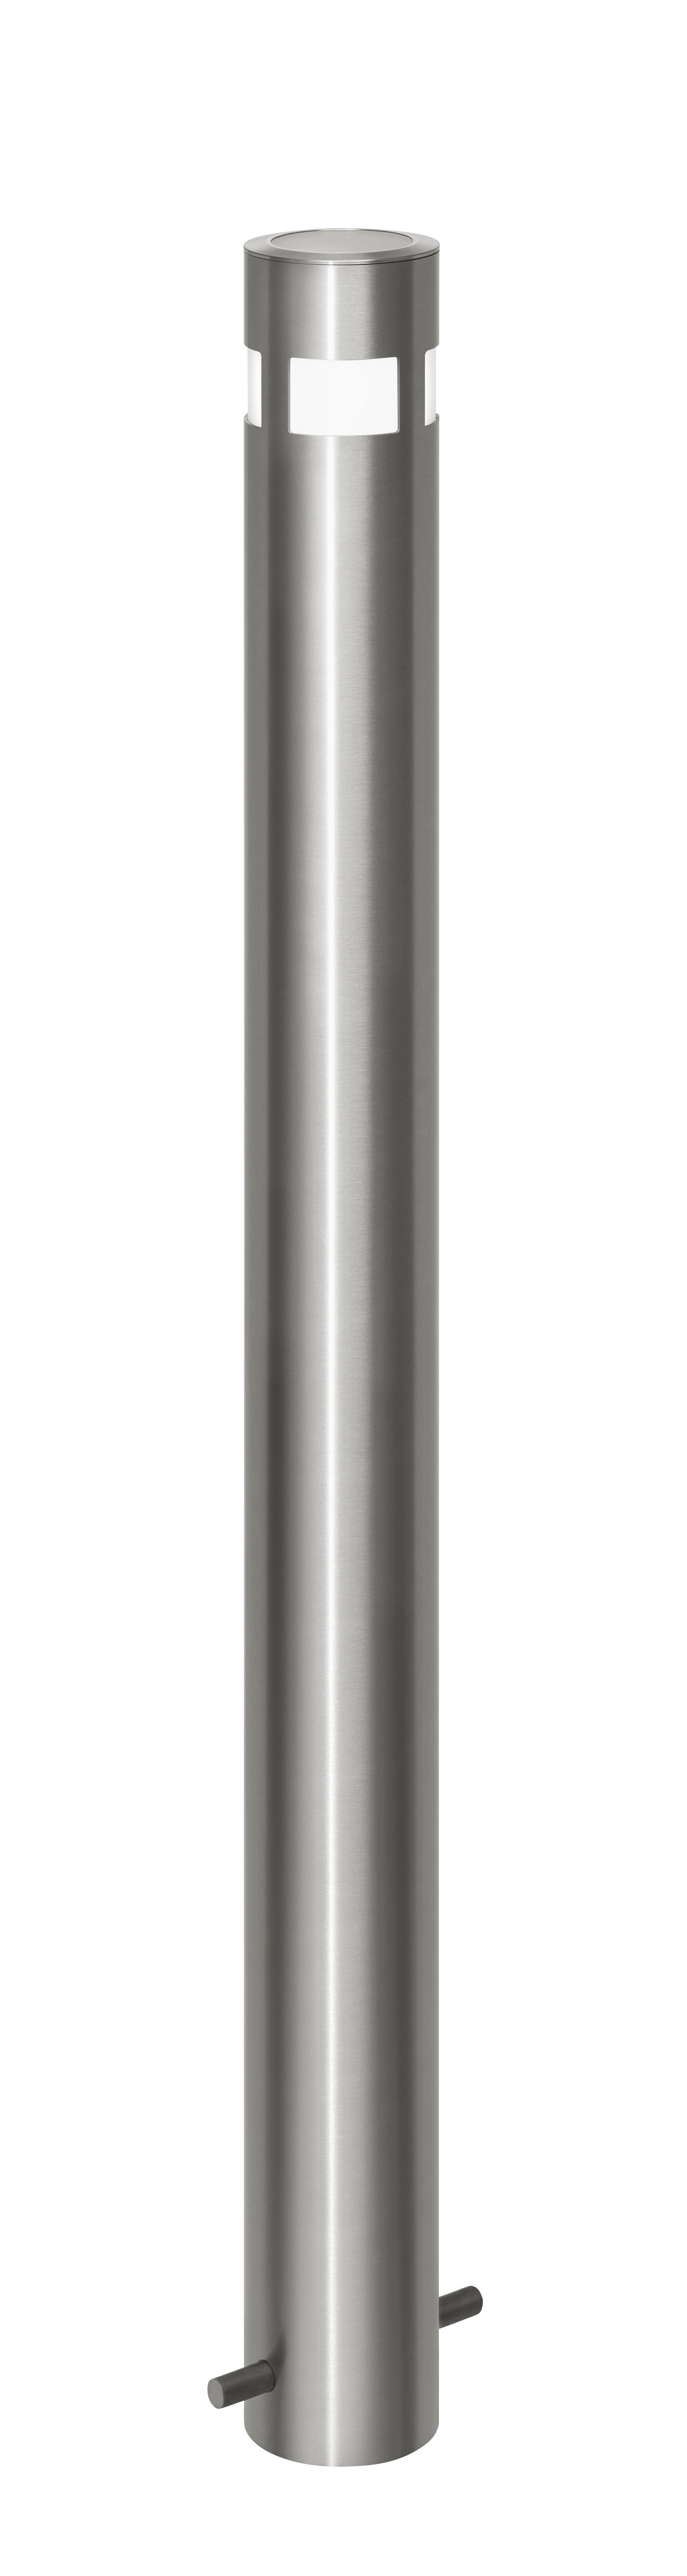 Absperrpfosten Ø 102 mm